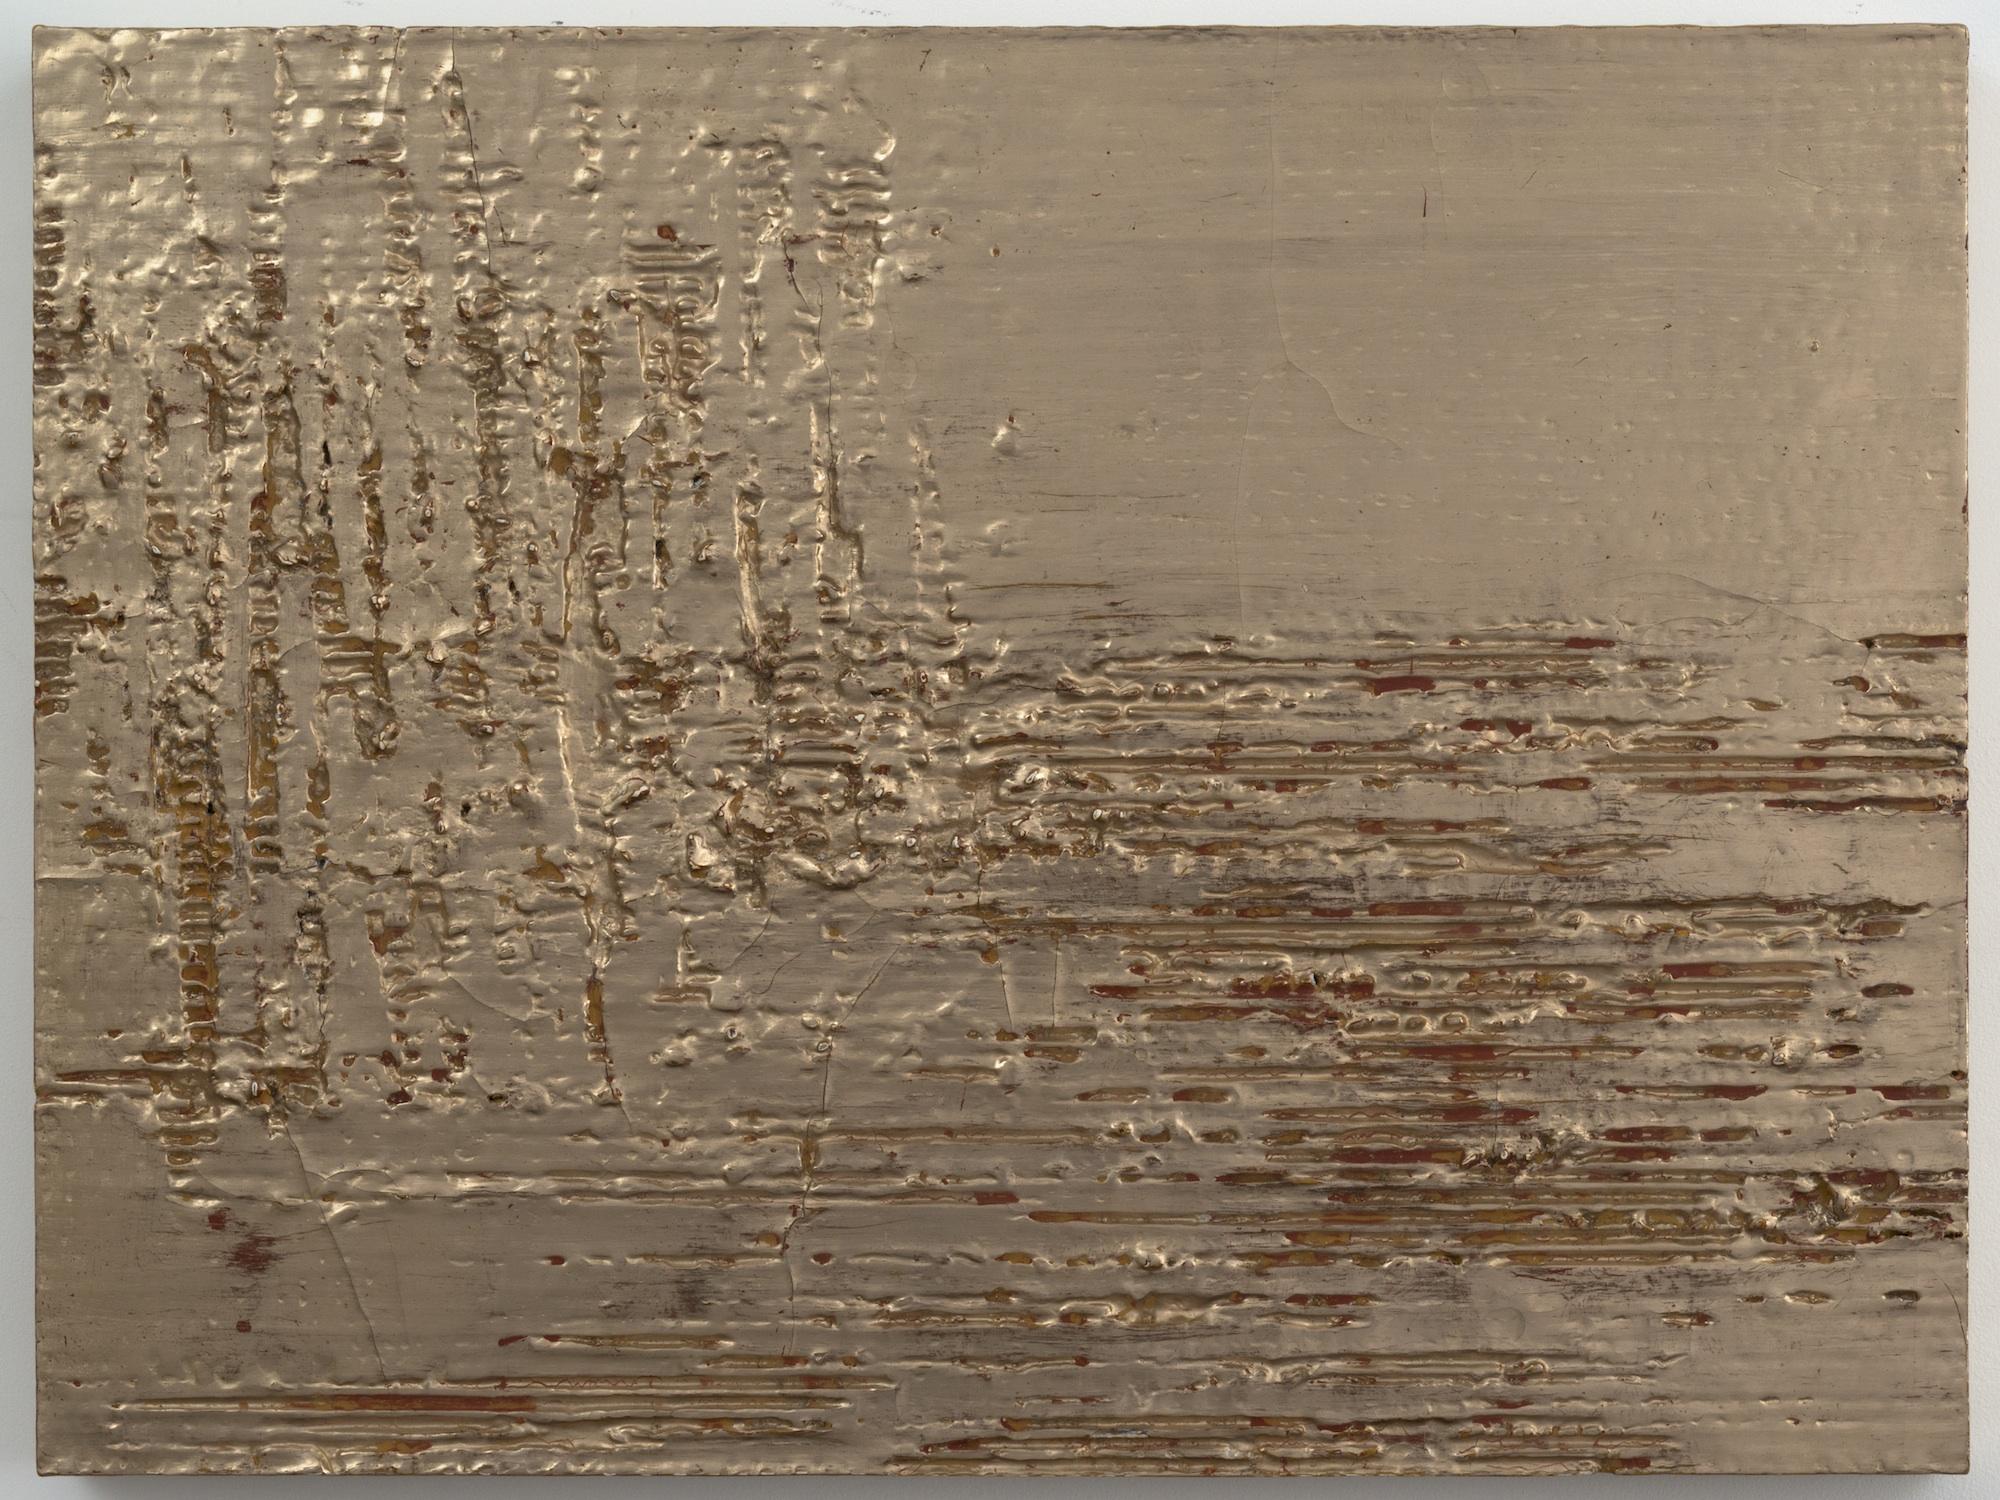 Nancy Lorenz, Moon Gold Cardboard (I),2013, Cardboard, Clay, Resin On Panel, 18 x 24 in.